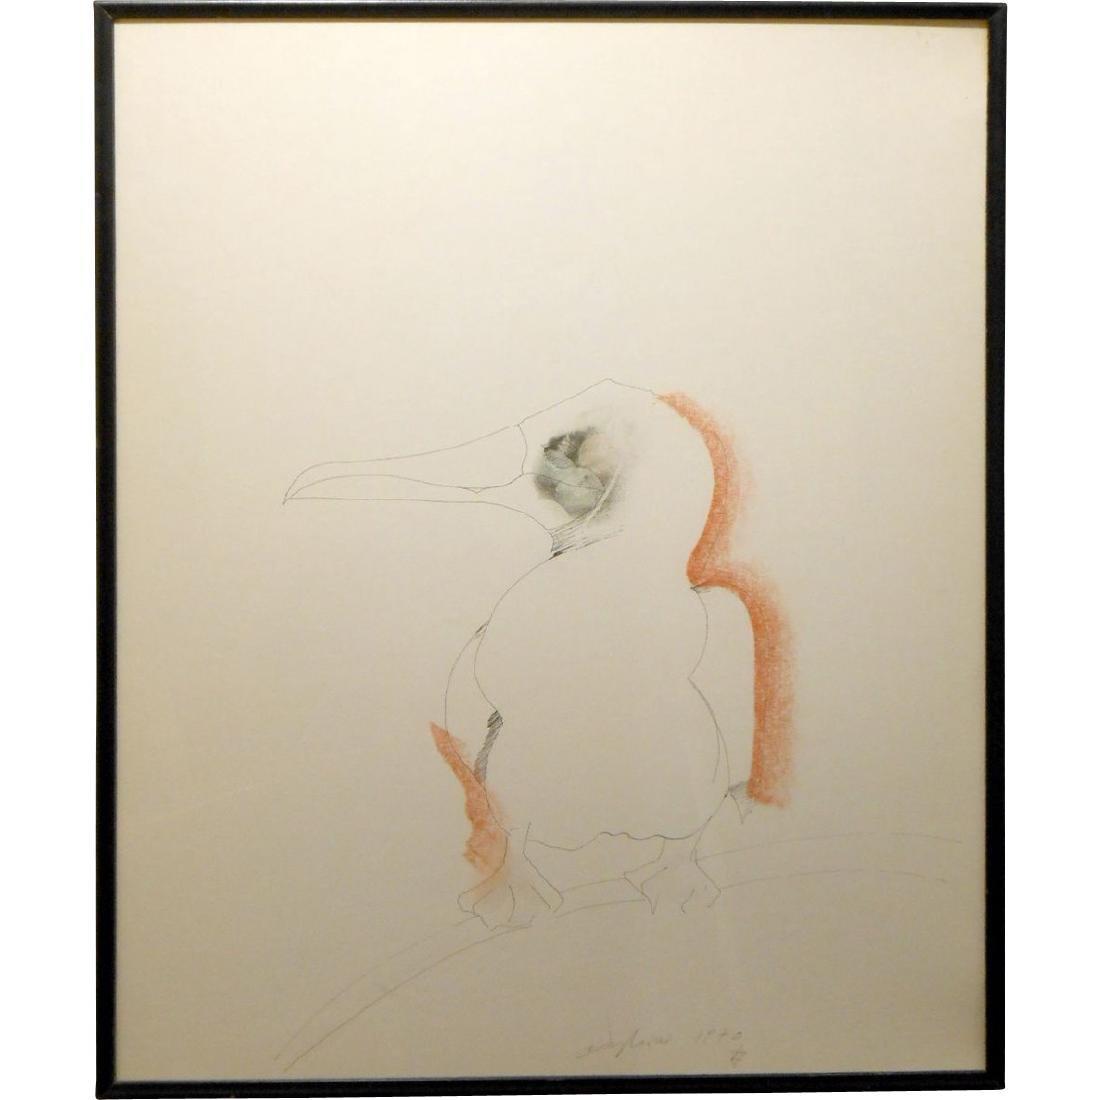 1970 Pelican Drawing By Sergei Davydov